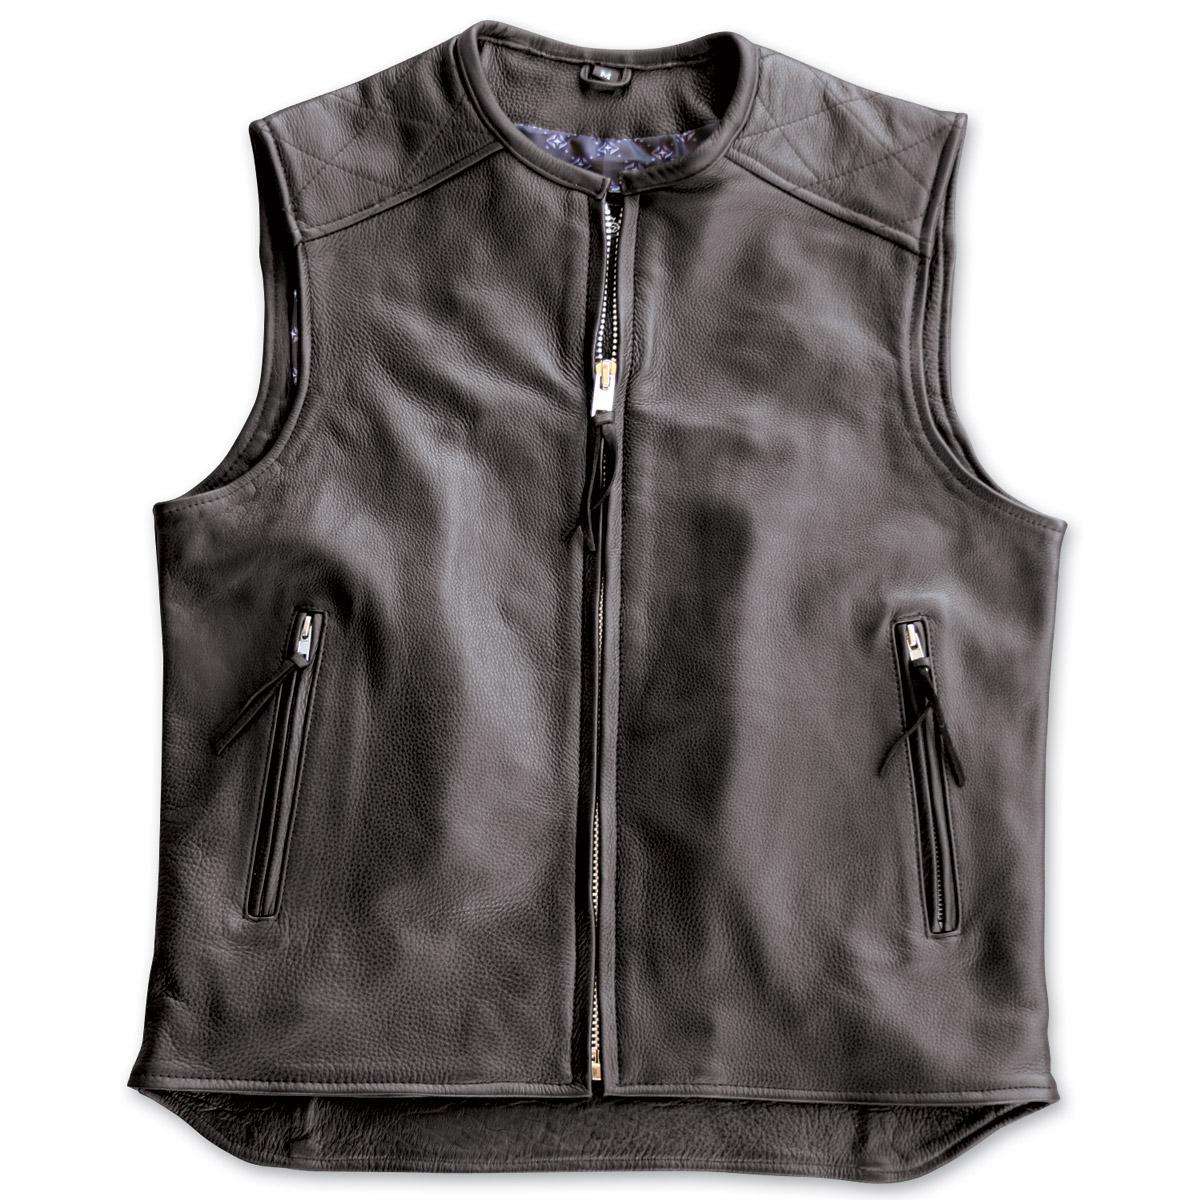 crank u0026 stroker supply hardball motorcycle black leather vest ... ygzqpki